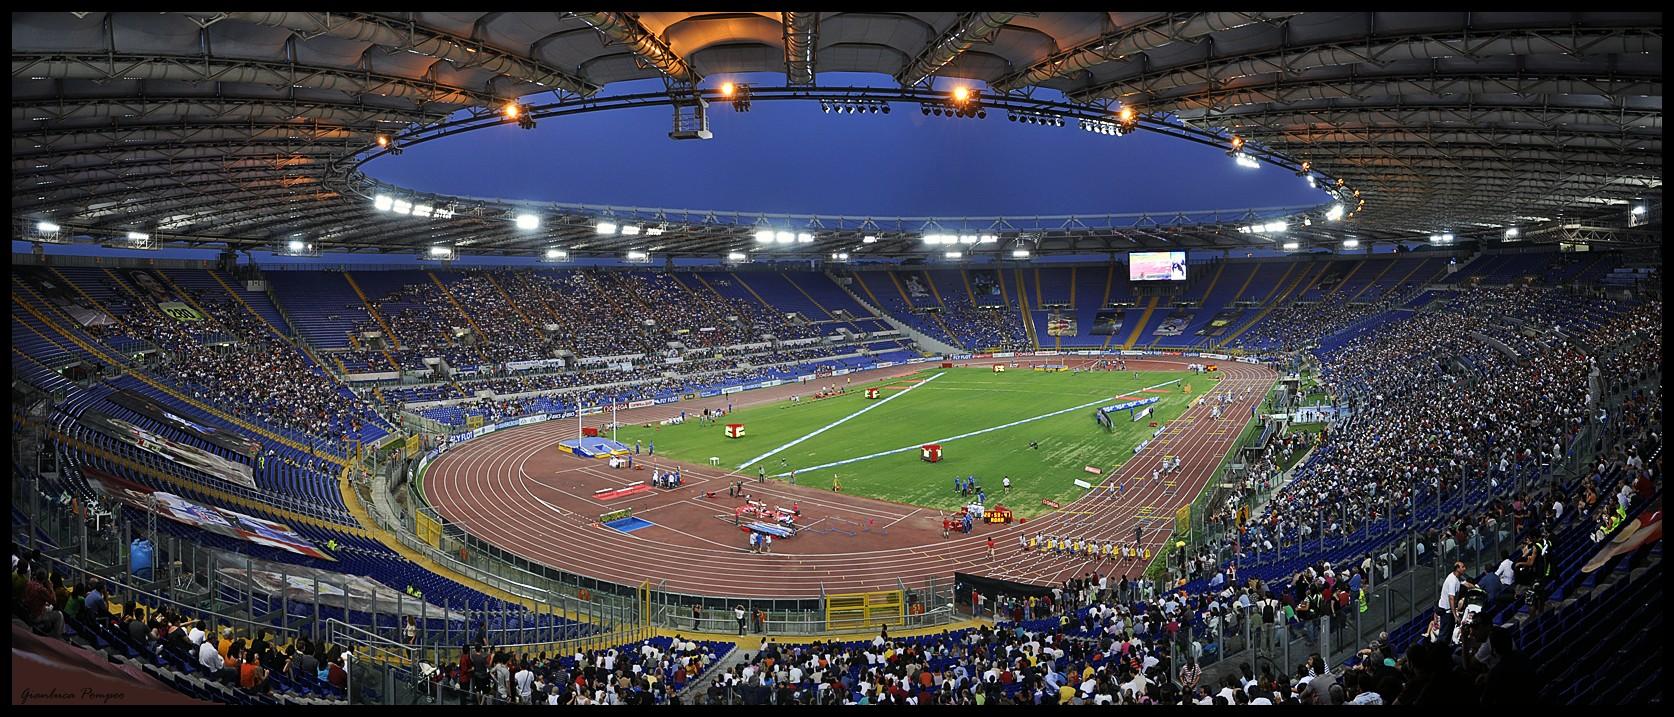 Stadio-Olimpico-–-The-Pride-of-Italy.jpg